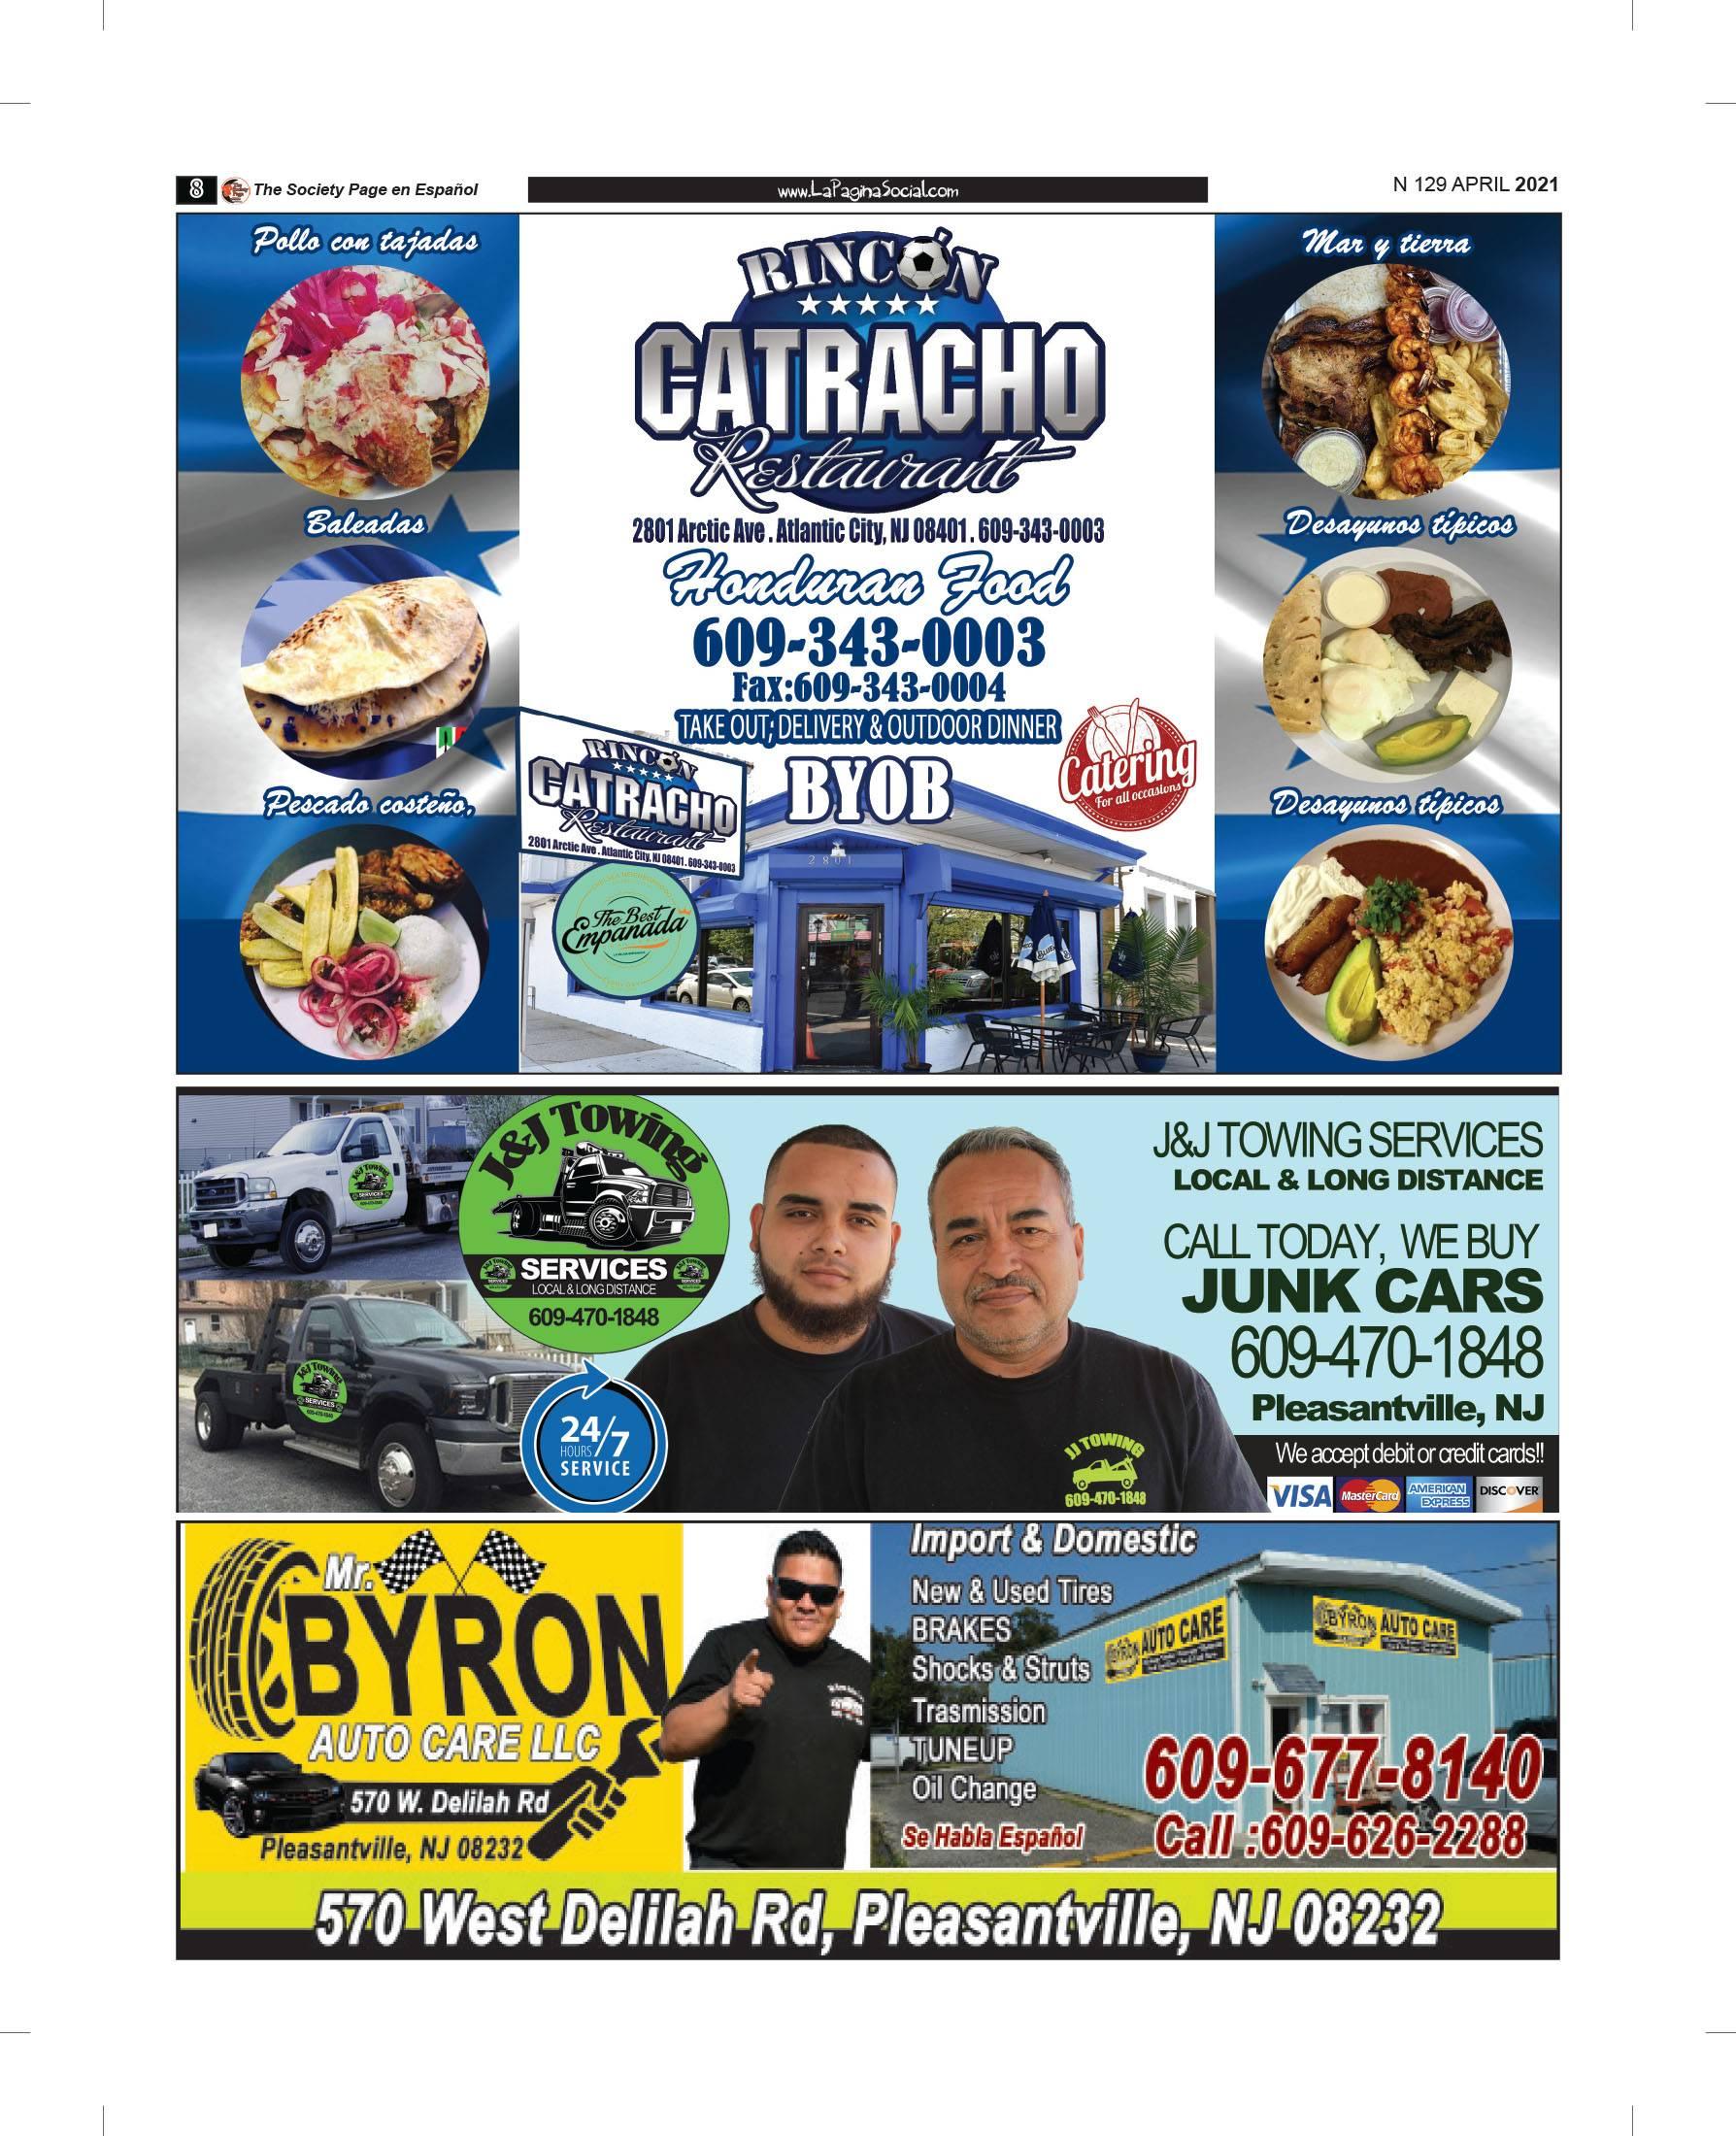 #RinconCatracho #J&JTowing #MrByronAutoCare